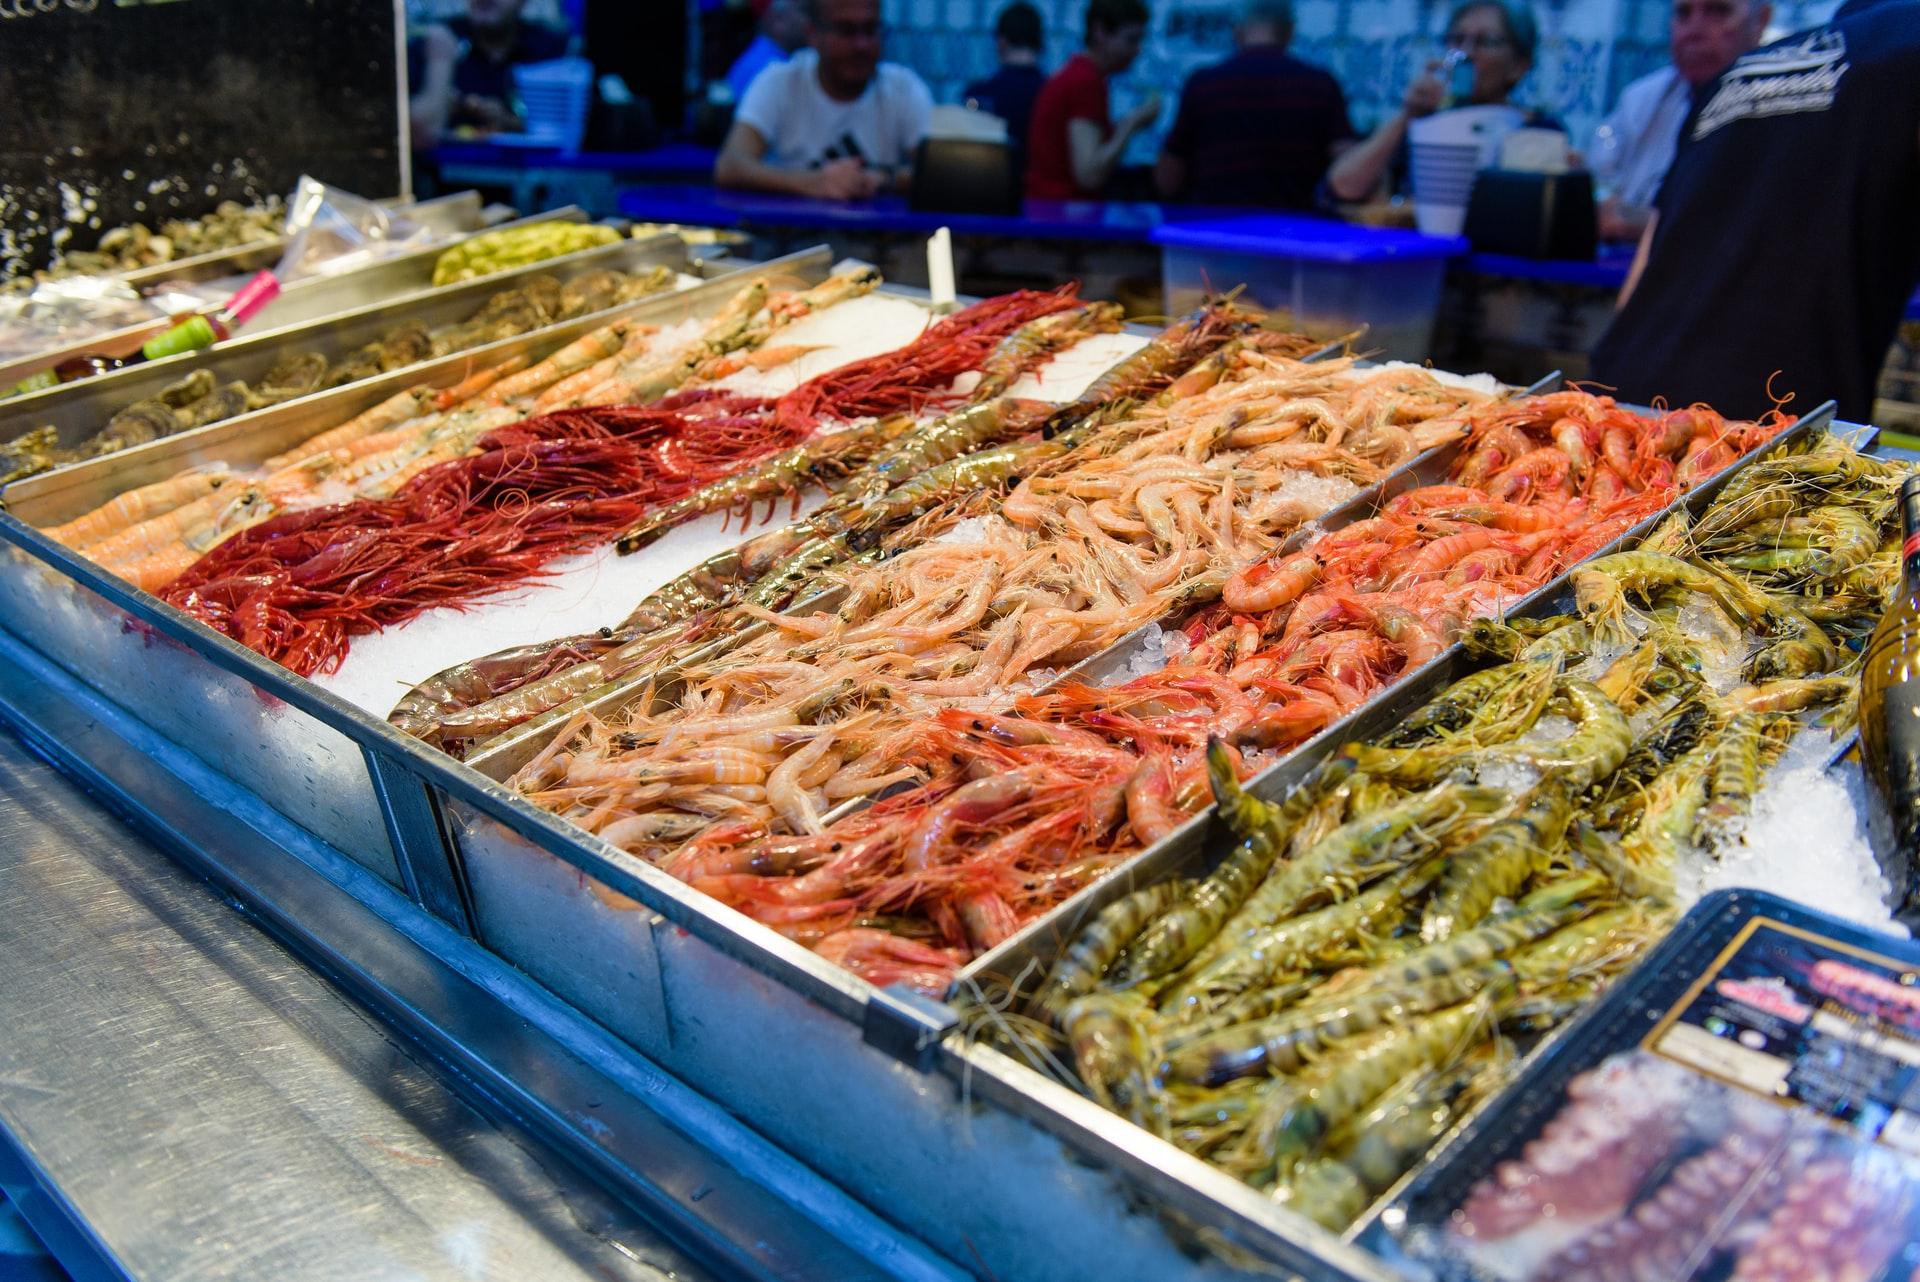 Permintaan ekspor seafood meningkat © Michal Mrozek/Unsplash